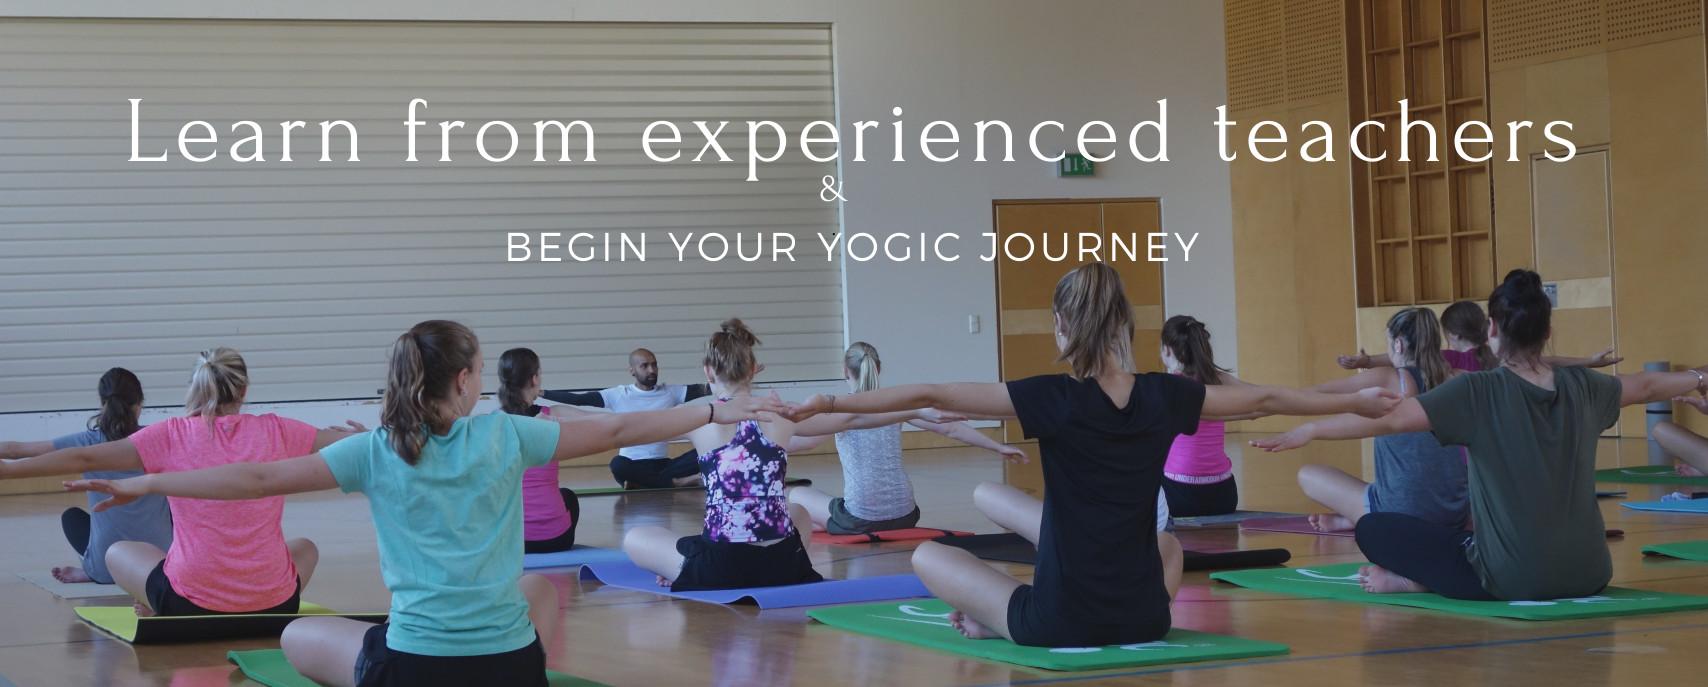 Yog Temple, Yoga Teacher Training in Austria, Yoga in Austria, Classical Hatha Yoga, Shamanism, YTTC200, Shamanism Course in Europe